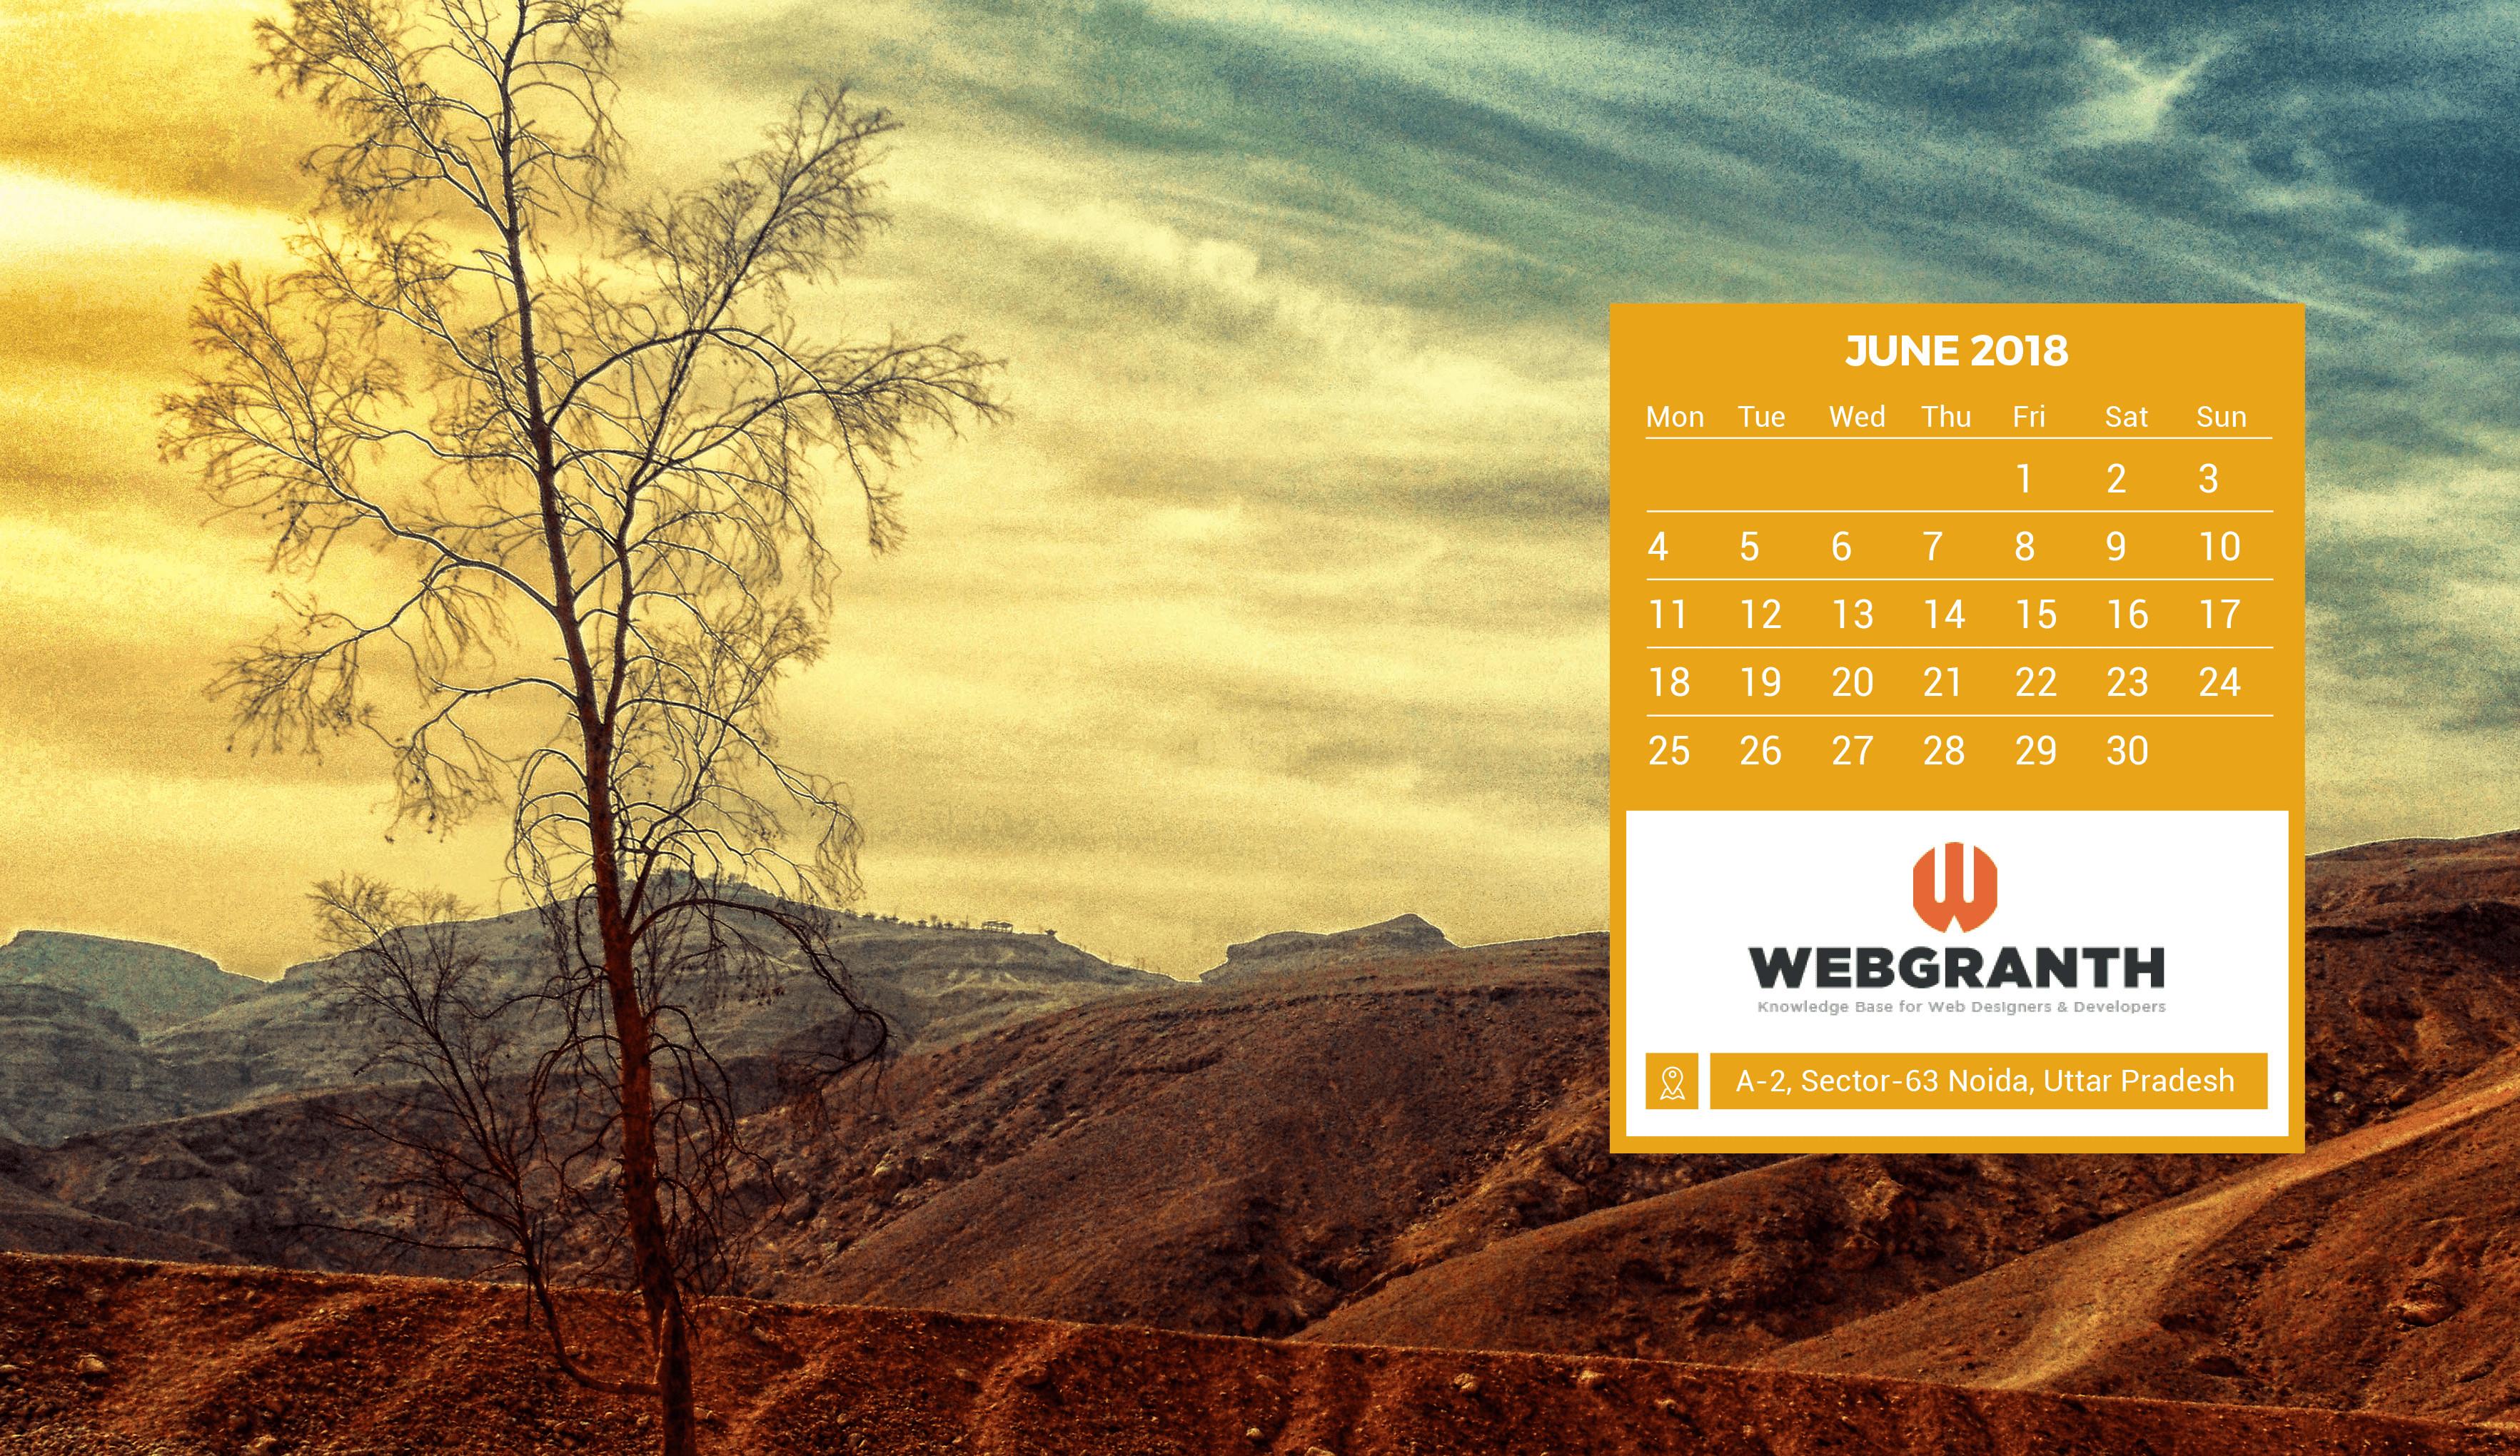 Desktop Wallpapers Calendar June 2018 (52+ Images